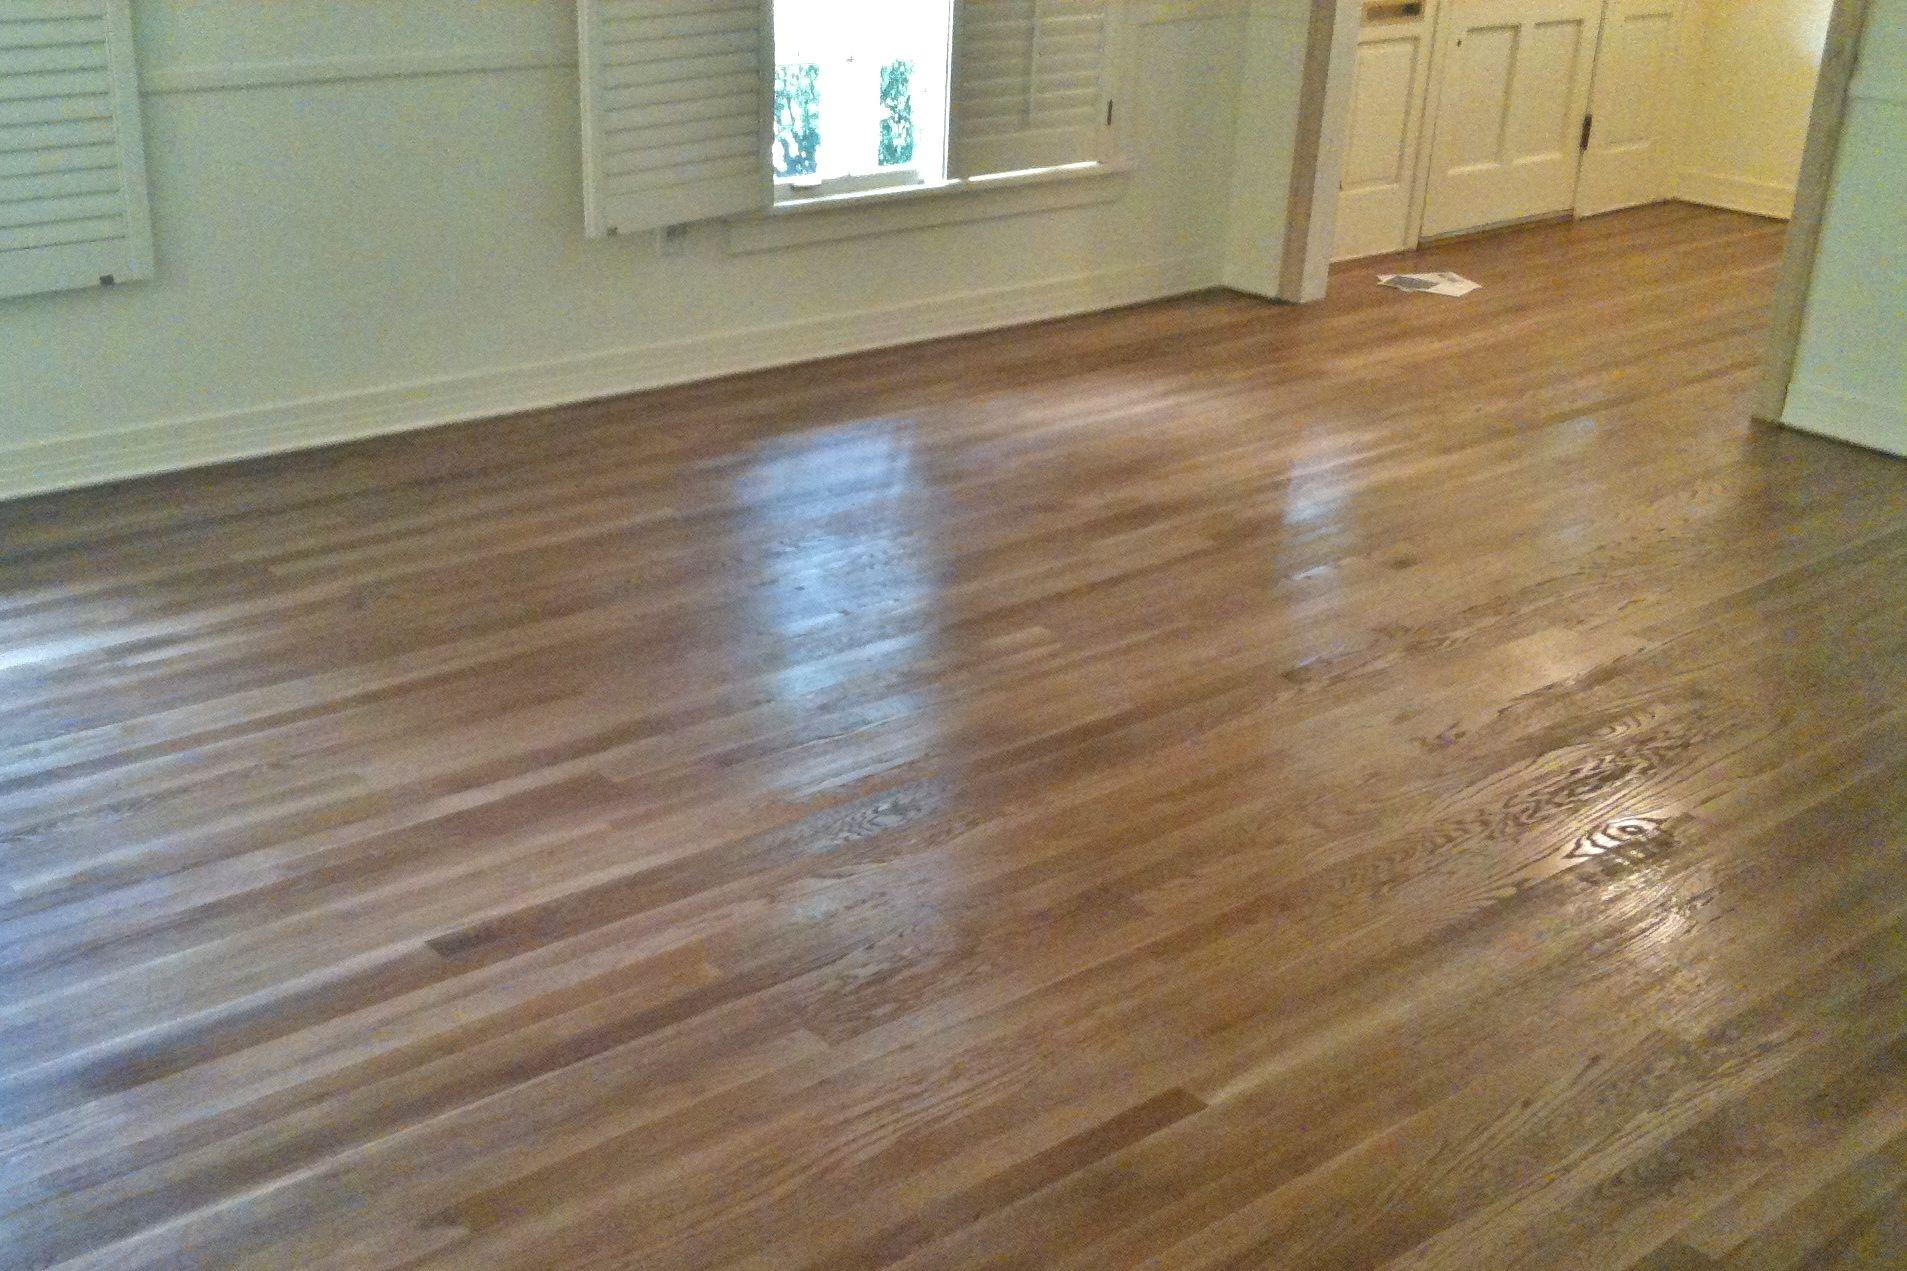 hardwood floor refinishing colors of oak meet special walnut home design pinterest flooring throughout minwax special walnut stain on oak hardwood floors walnut hardwood flooring refinishing hardwood